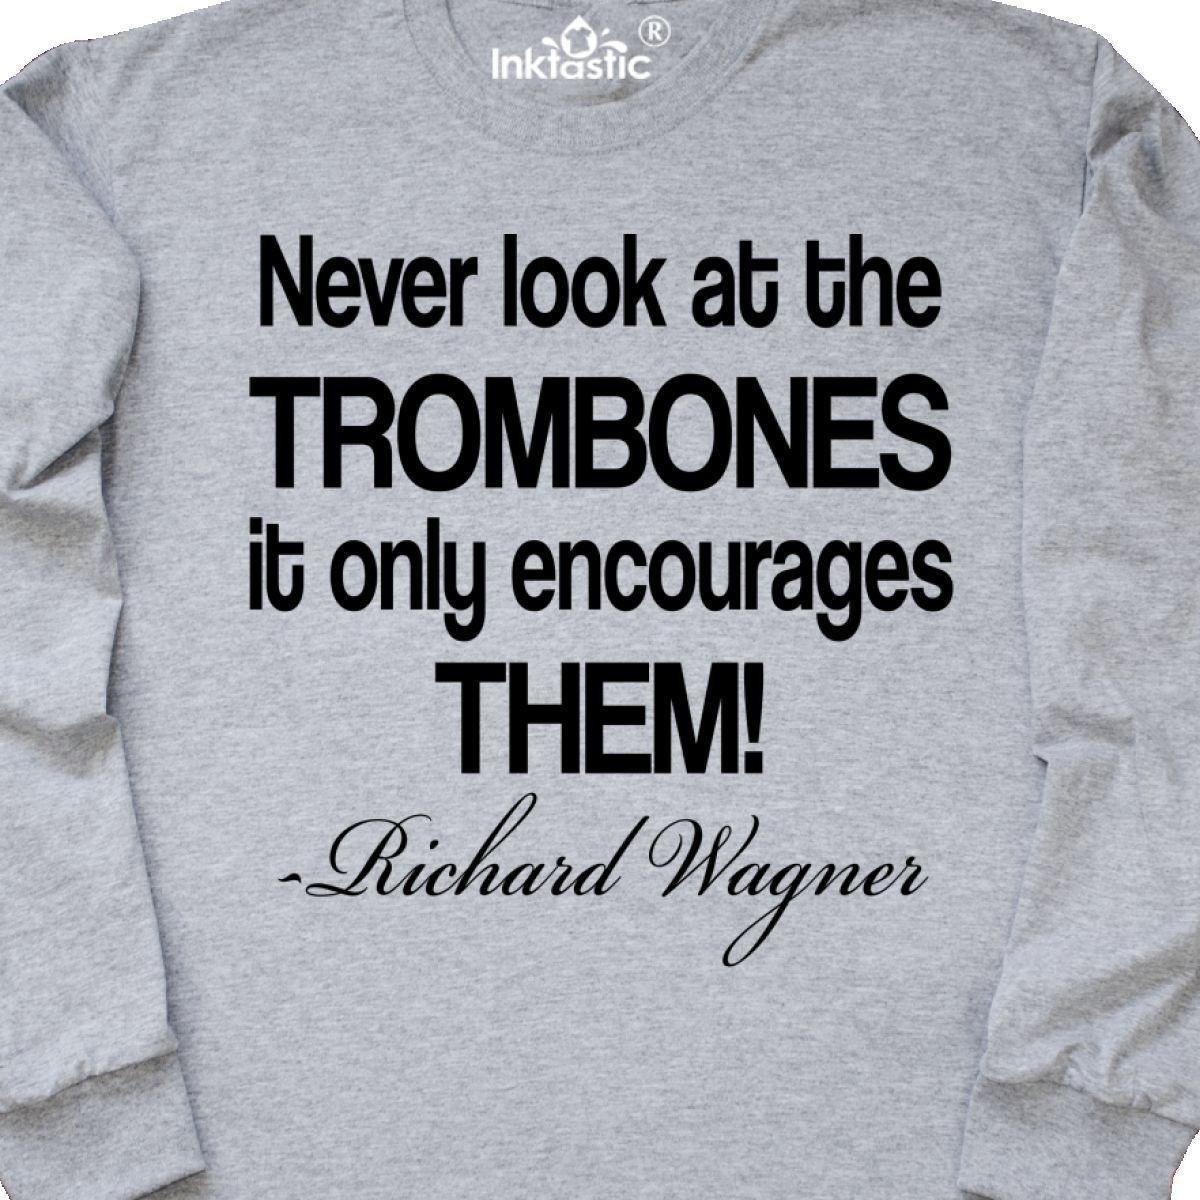 Inktastic-Trombone-Music-Quote-Richard-Wagner-Long-Sleeve-T-Shirt-Player-Gift